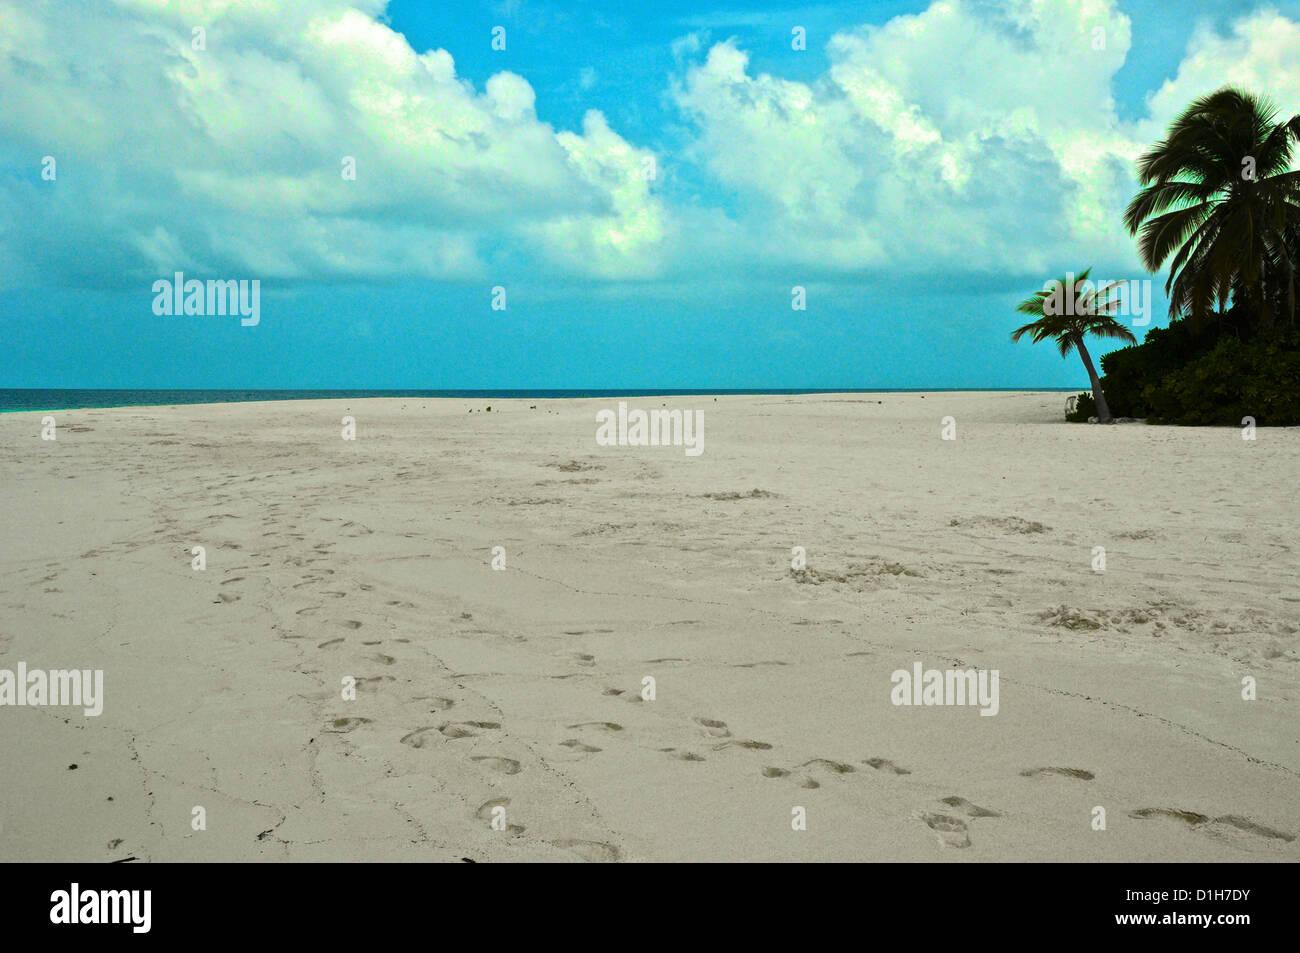 desert island in the maldives - Stock Image